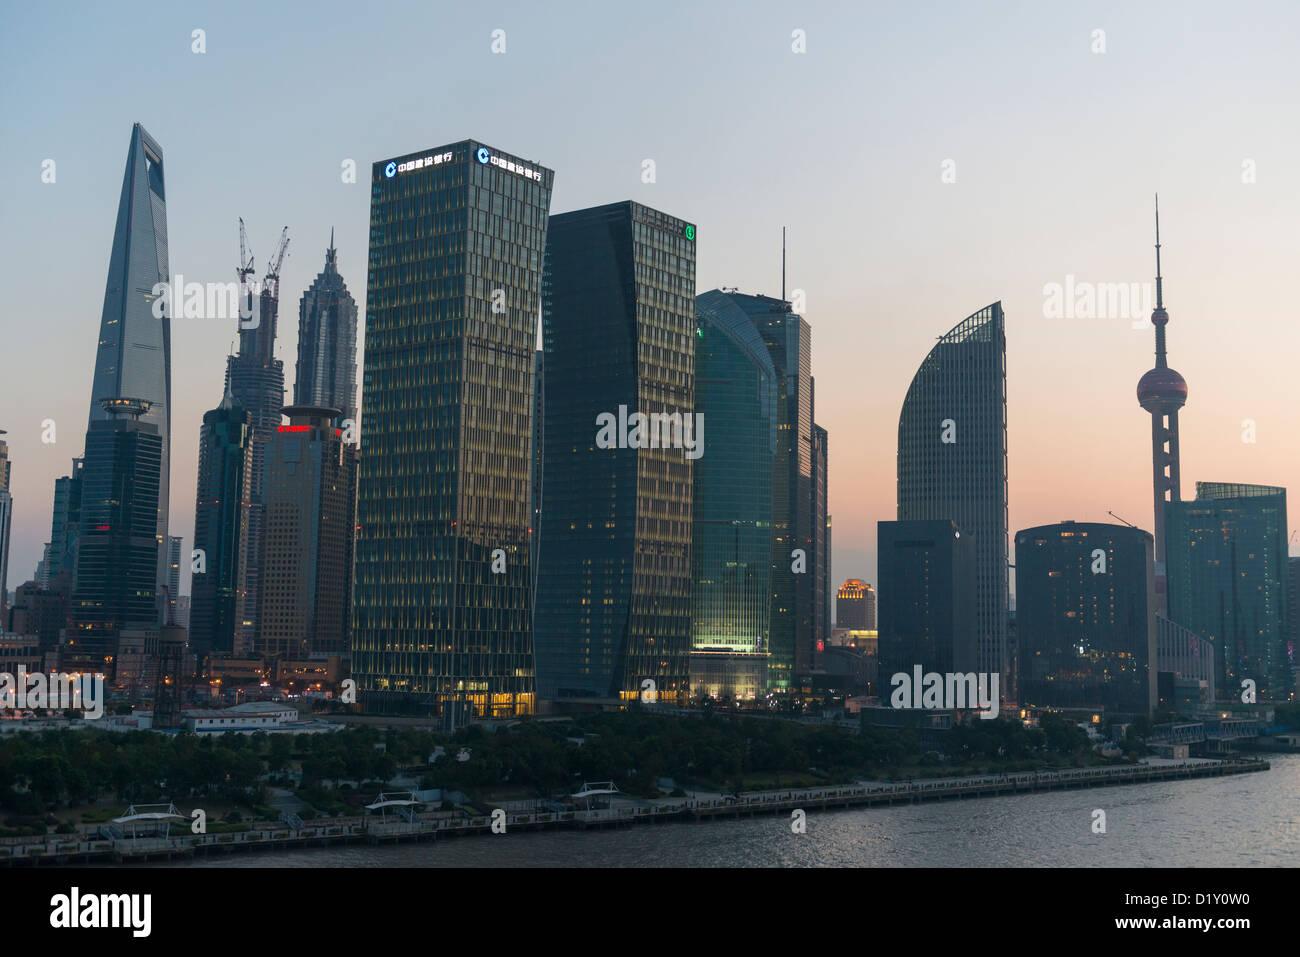 Pudong Skyline at Night, Shanghai, China - Stock Image